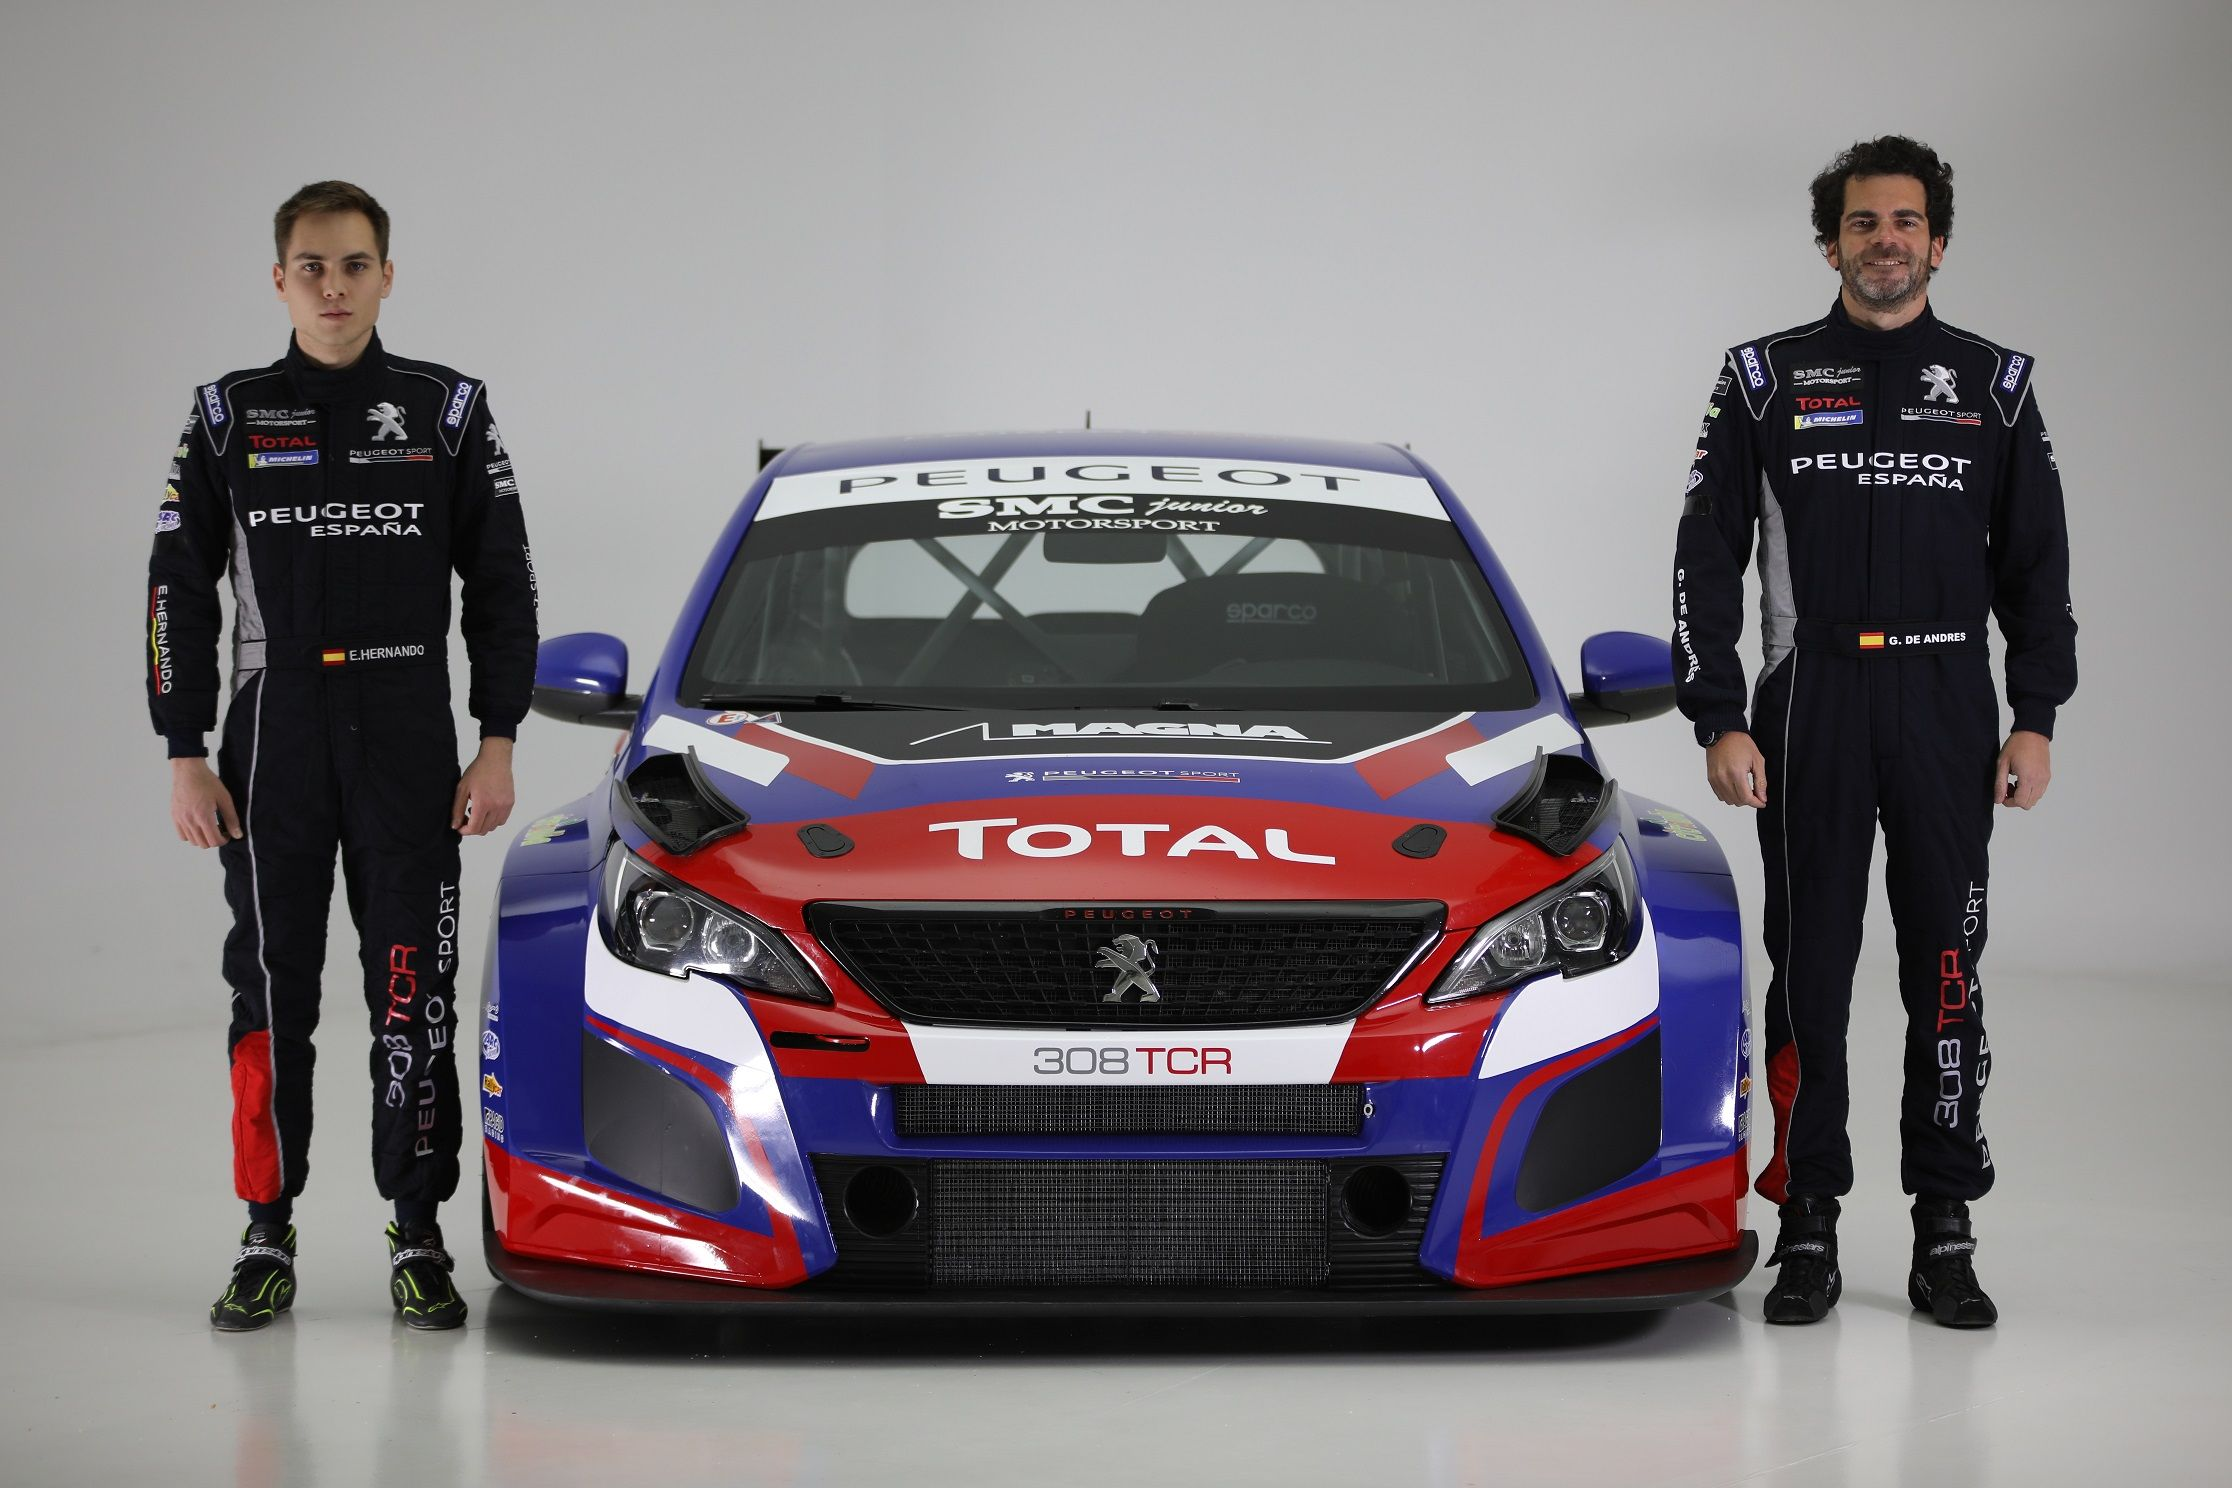 El Peugeot 308 TCR, a la conquista del TCR CER con Gonzalo de Andrés y Enrique Hernando